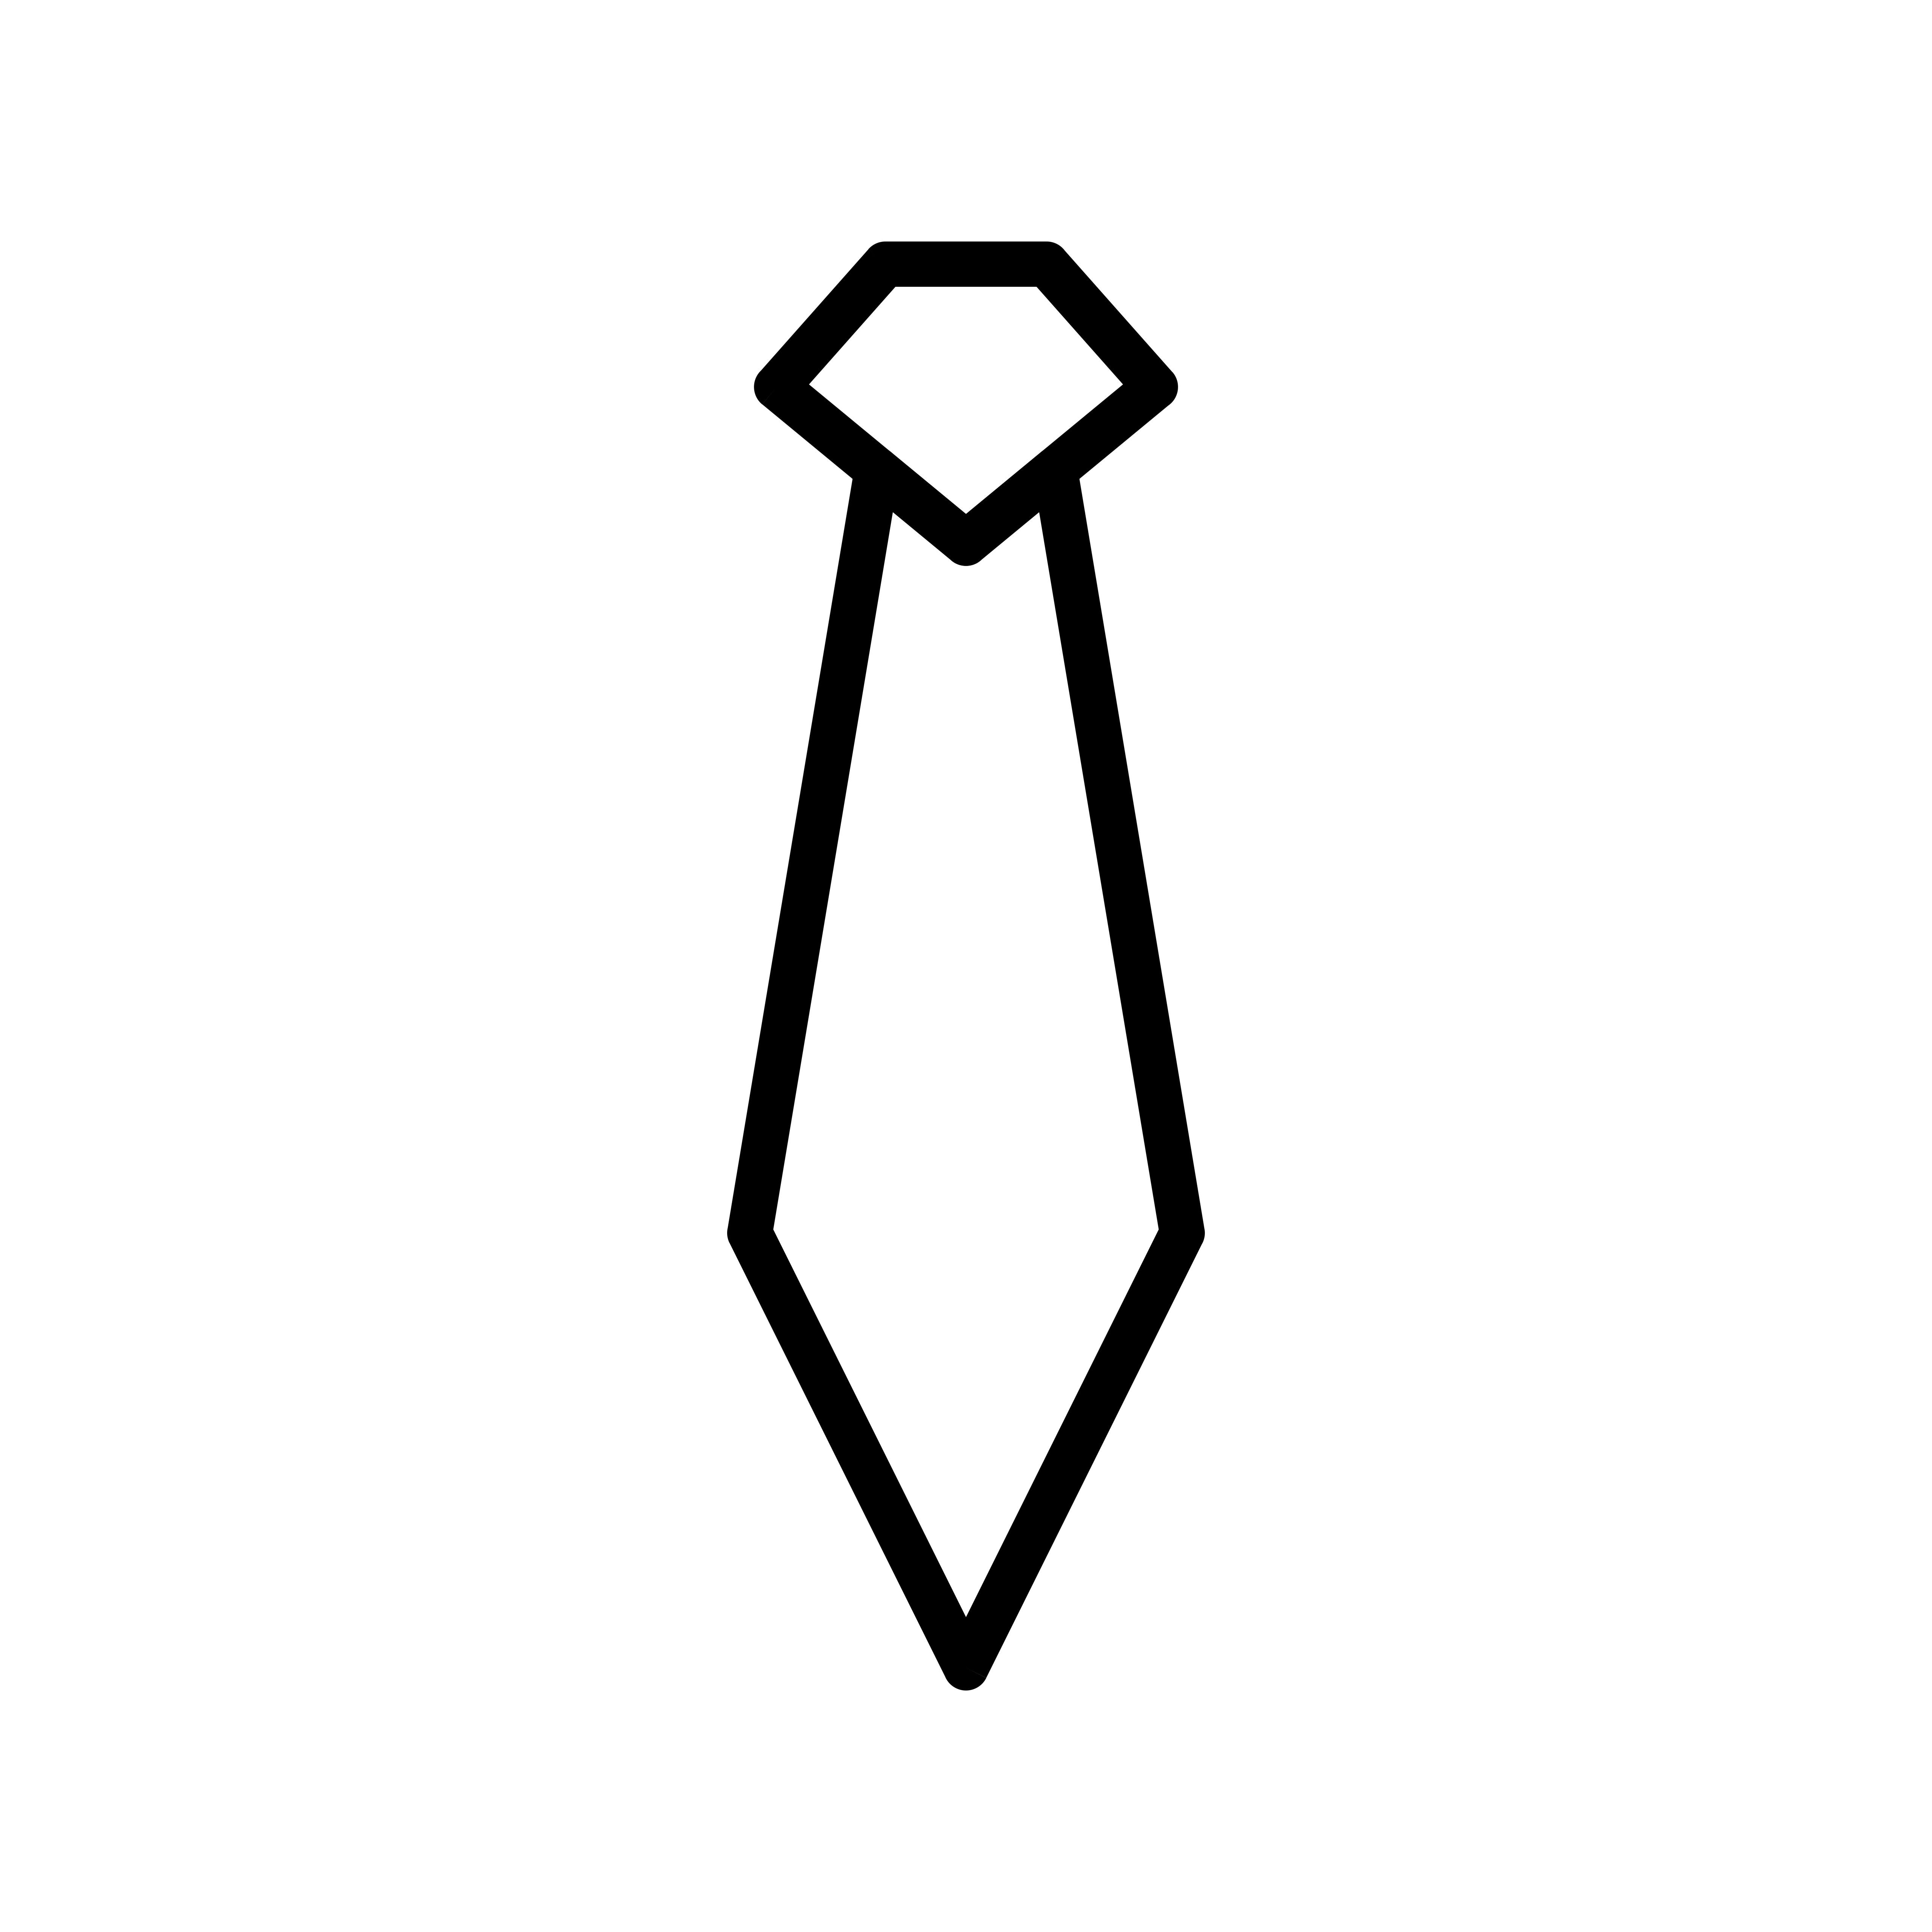 Black Tie Event Free Vector Art